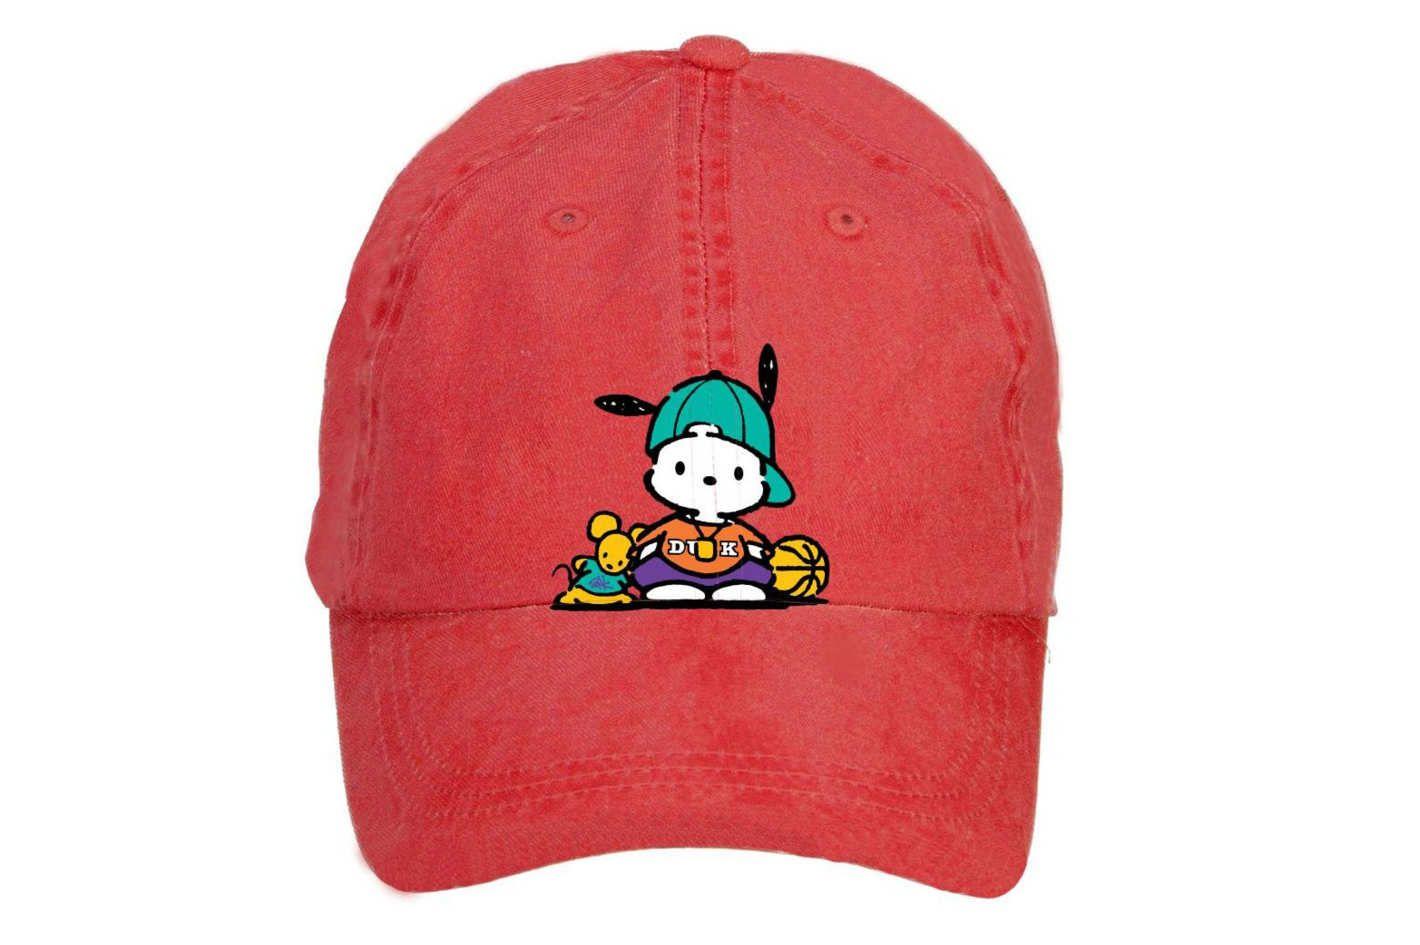 31 Of The Best Sanrio Products On Amazon Sanrio Japanese Toys Hello Kitty